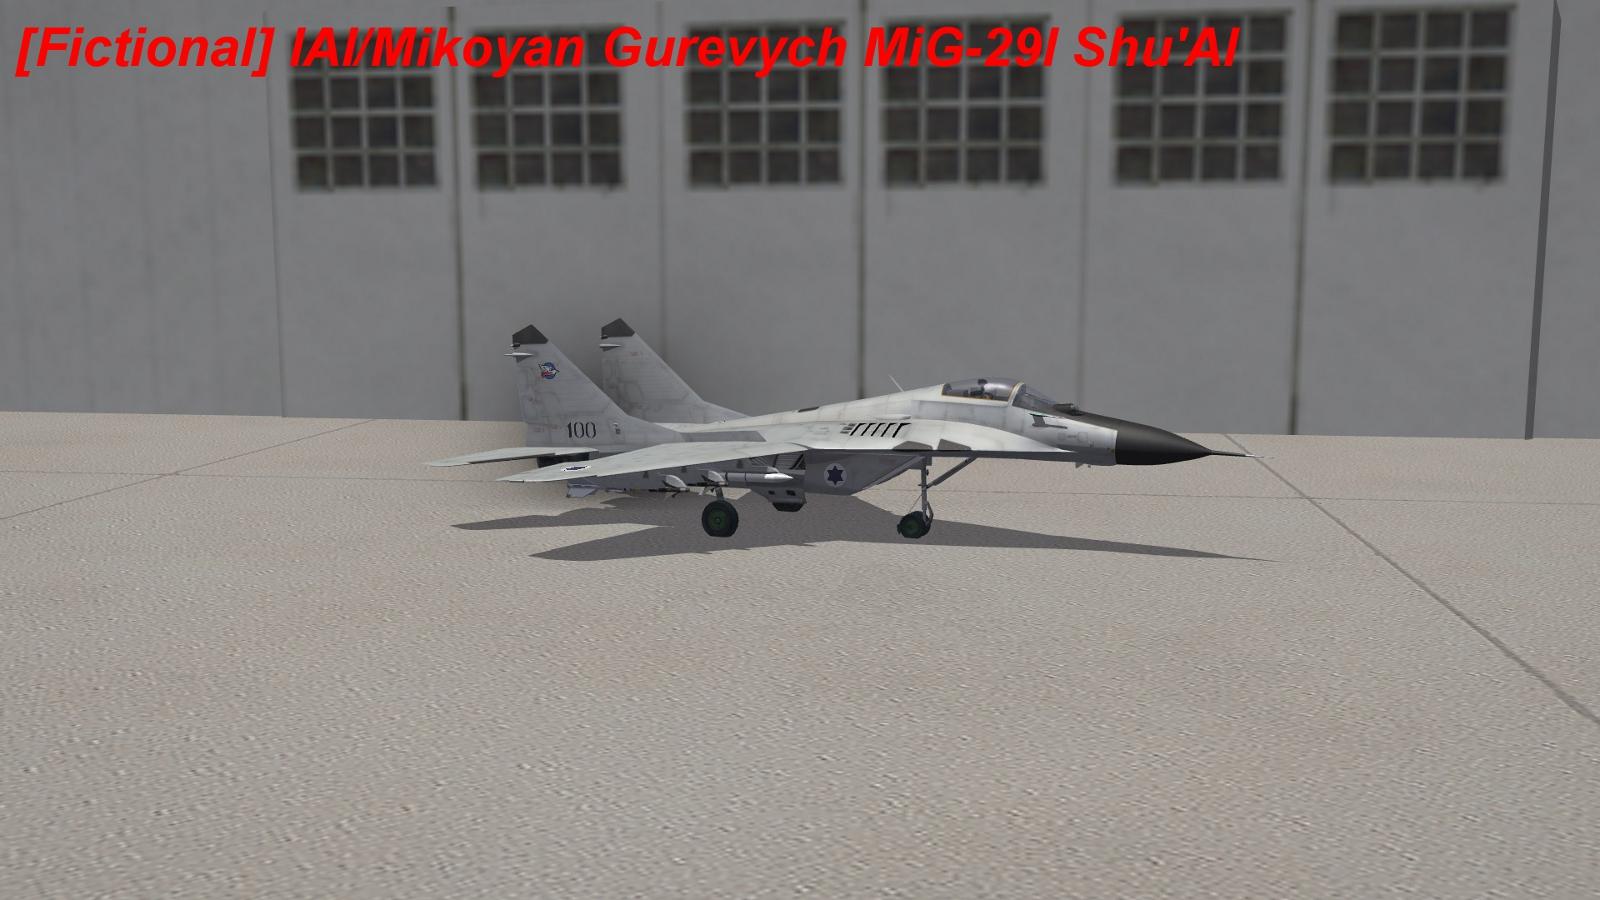 [Fictional] IAI/Mikoyan Gurevych MiG-29I Shu'Al (Fox)